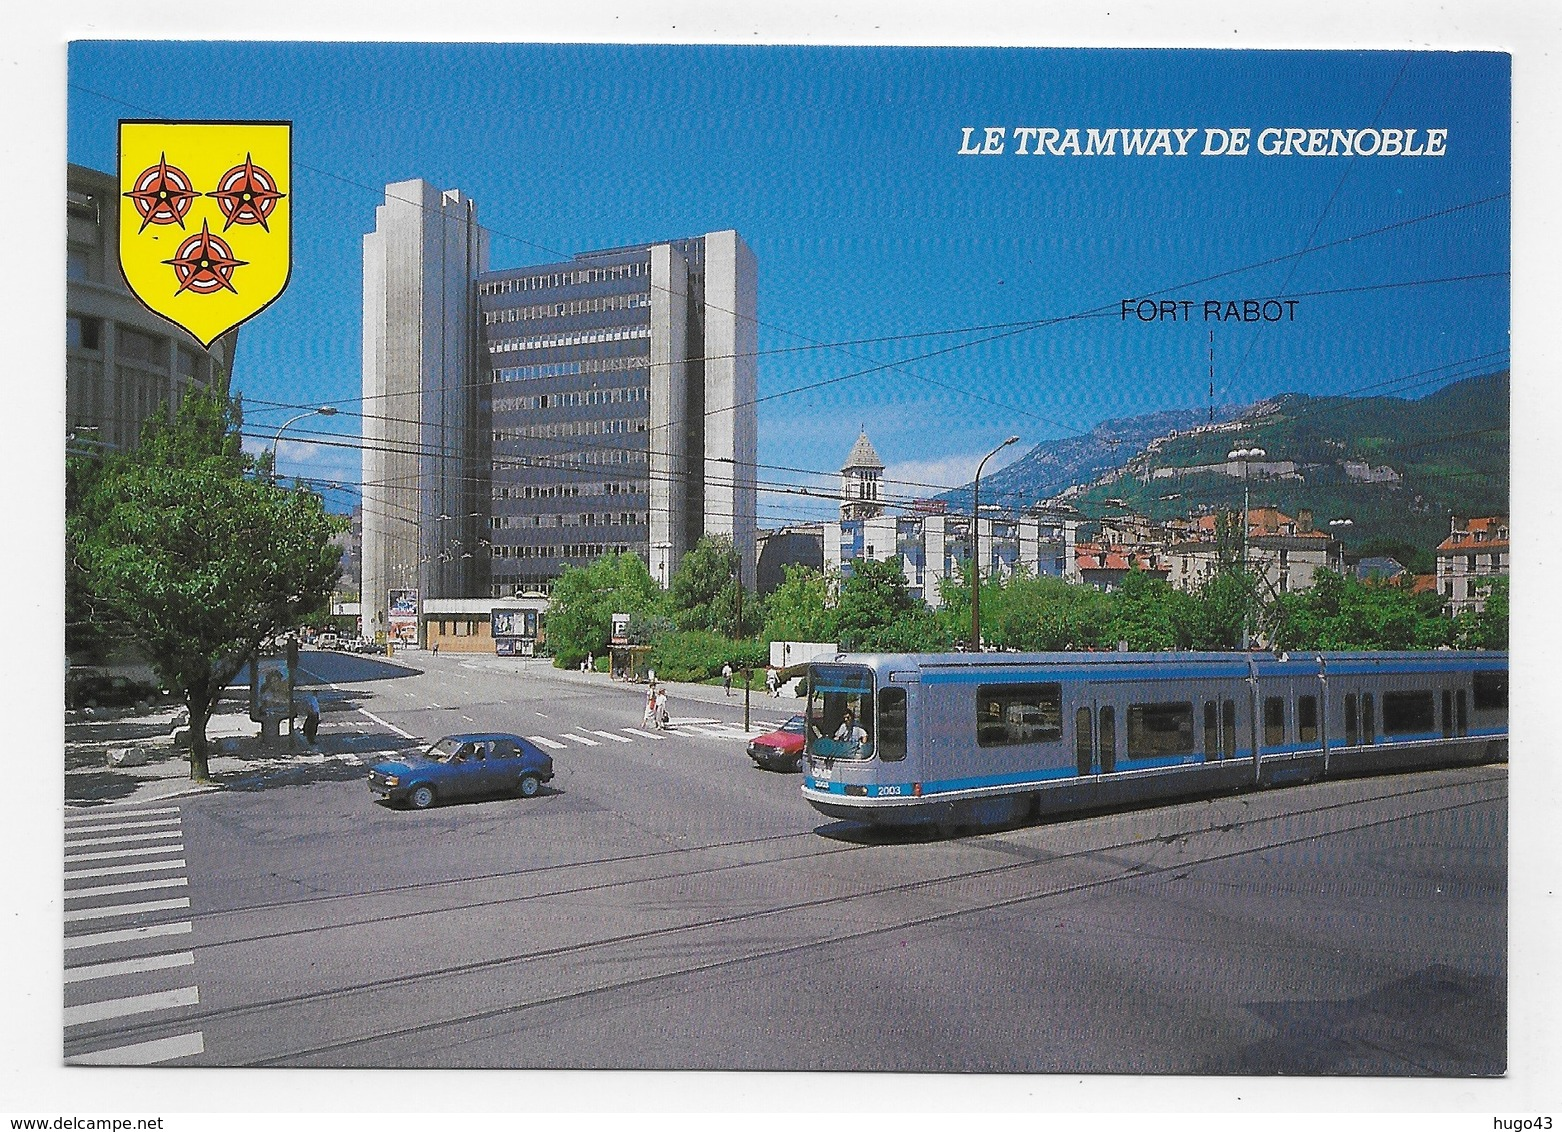 GRENOBLE - LE TRAMWAY - LA BIBLIOTHEQUE MUNICIPALE - CENTRE P.T.T. AU FOND - LE FORT RABOT - CPM GF NON VOYAGEE - Grenoble